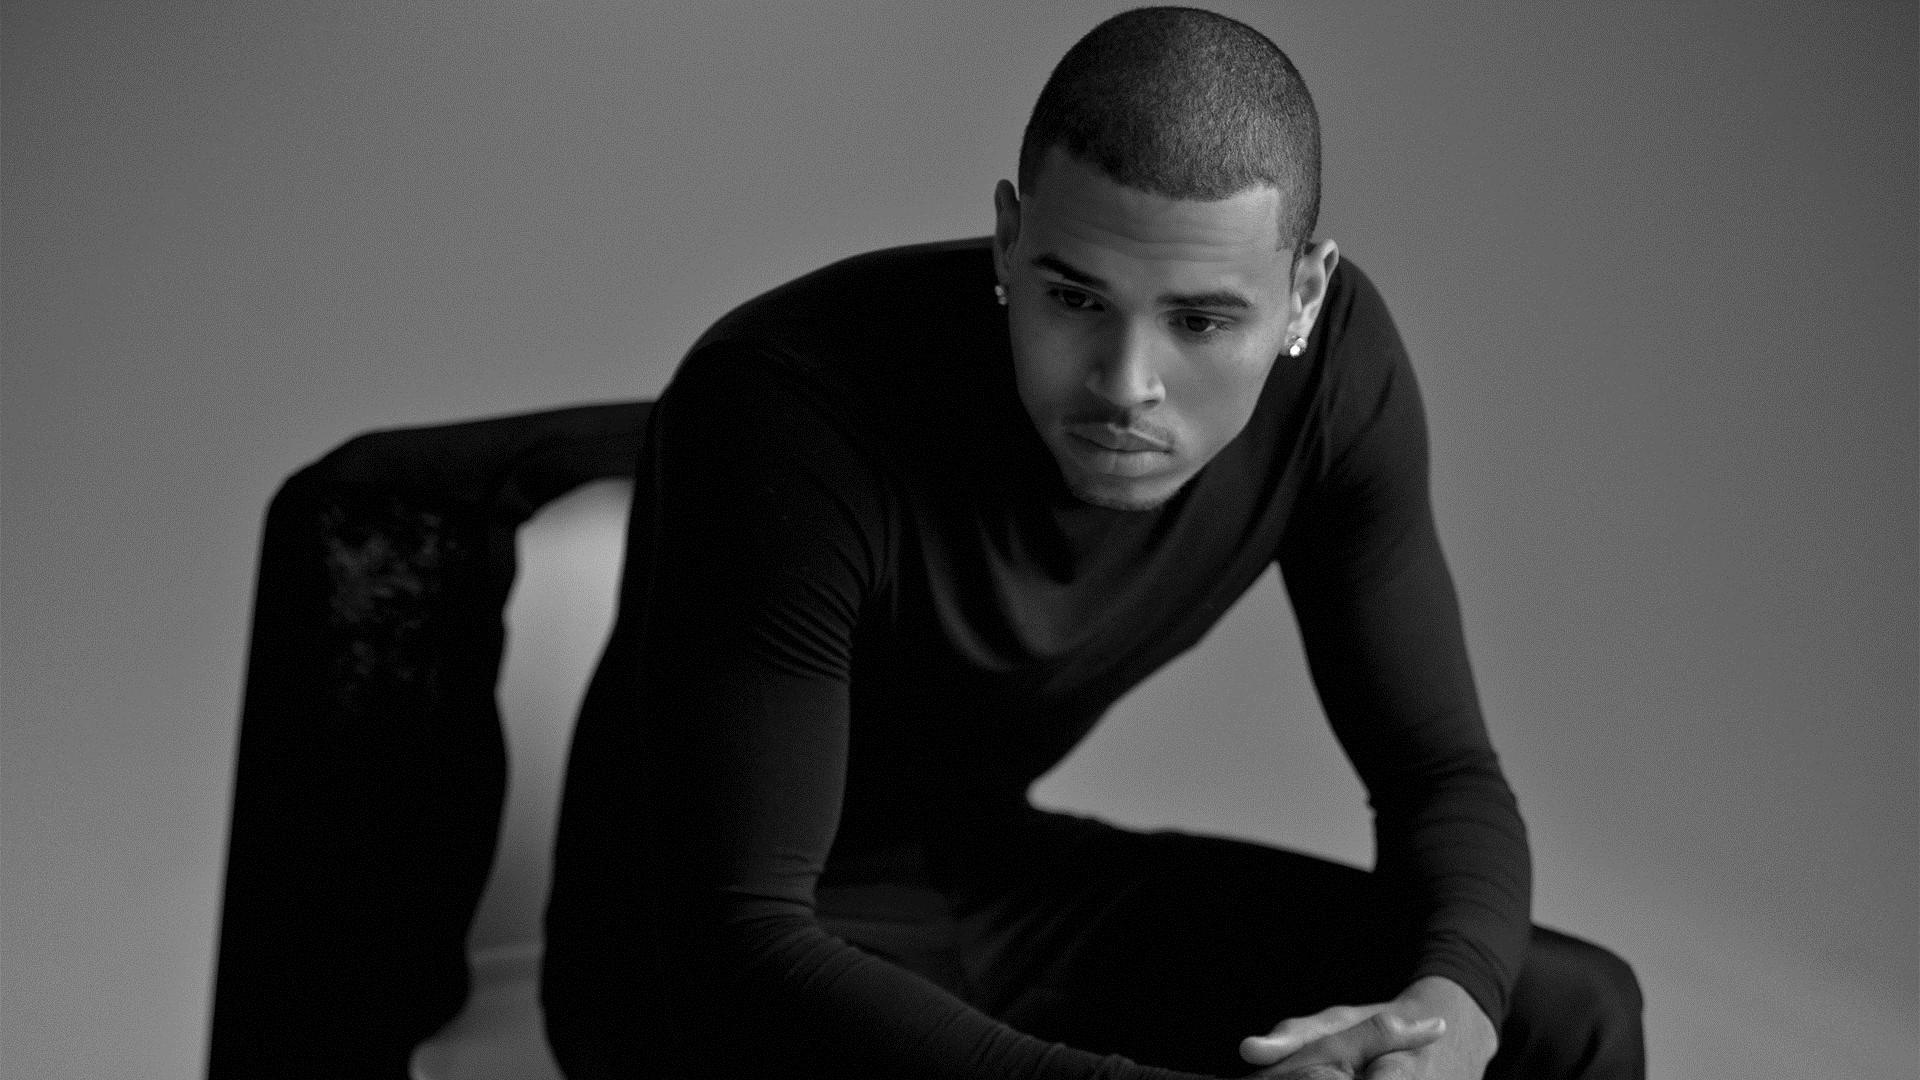 Chris Brown hd desktop wallpaper